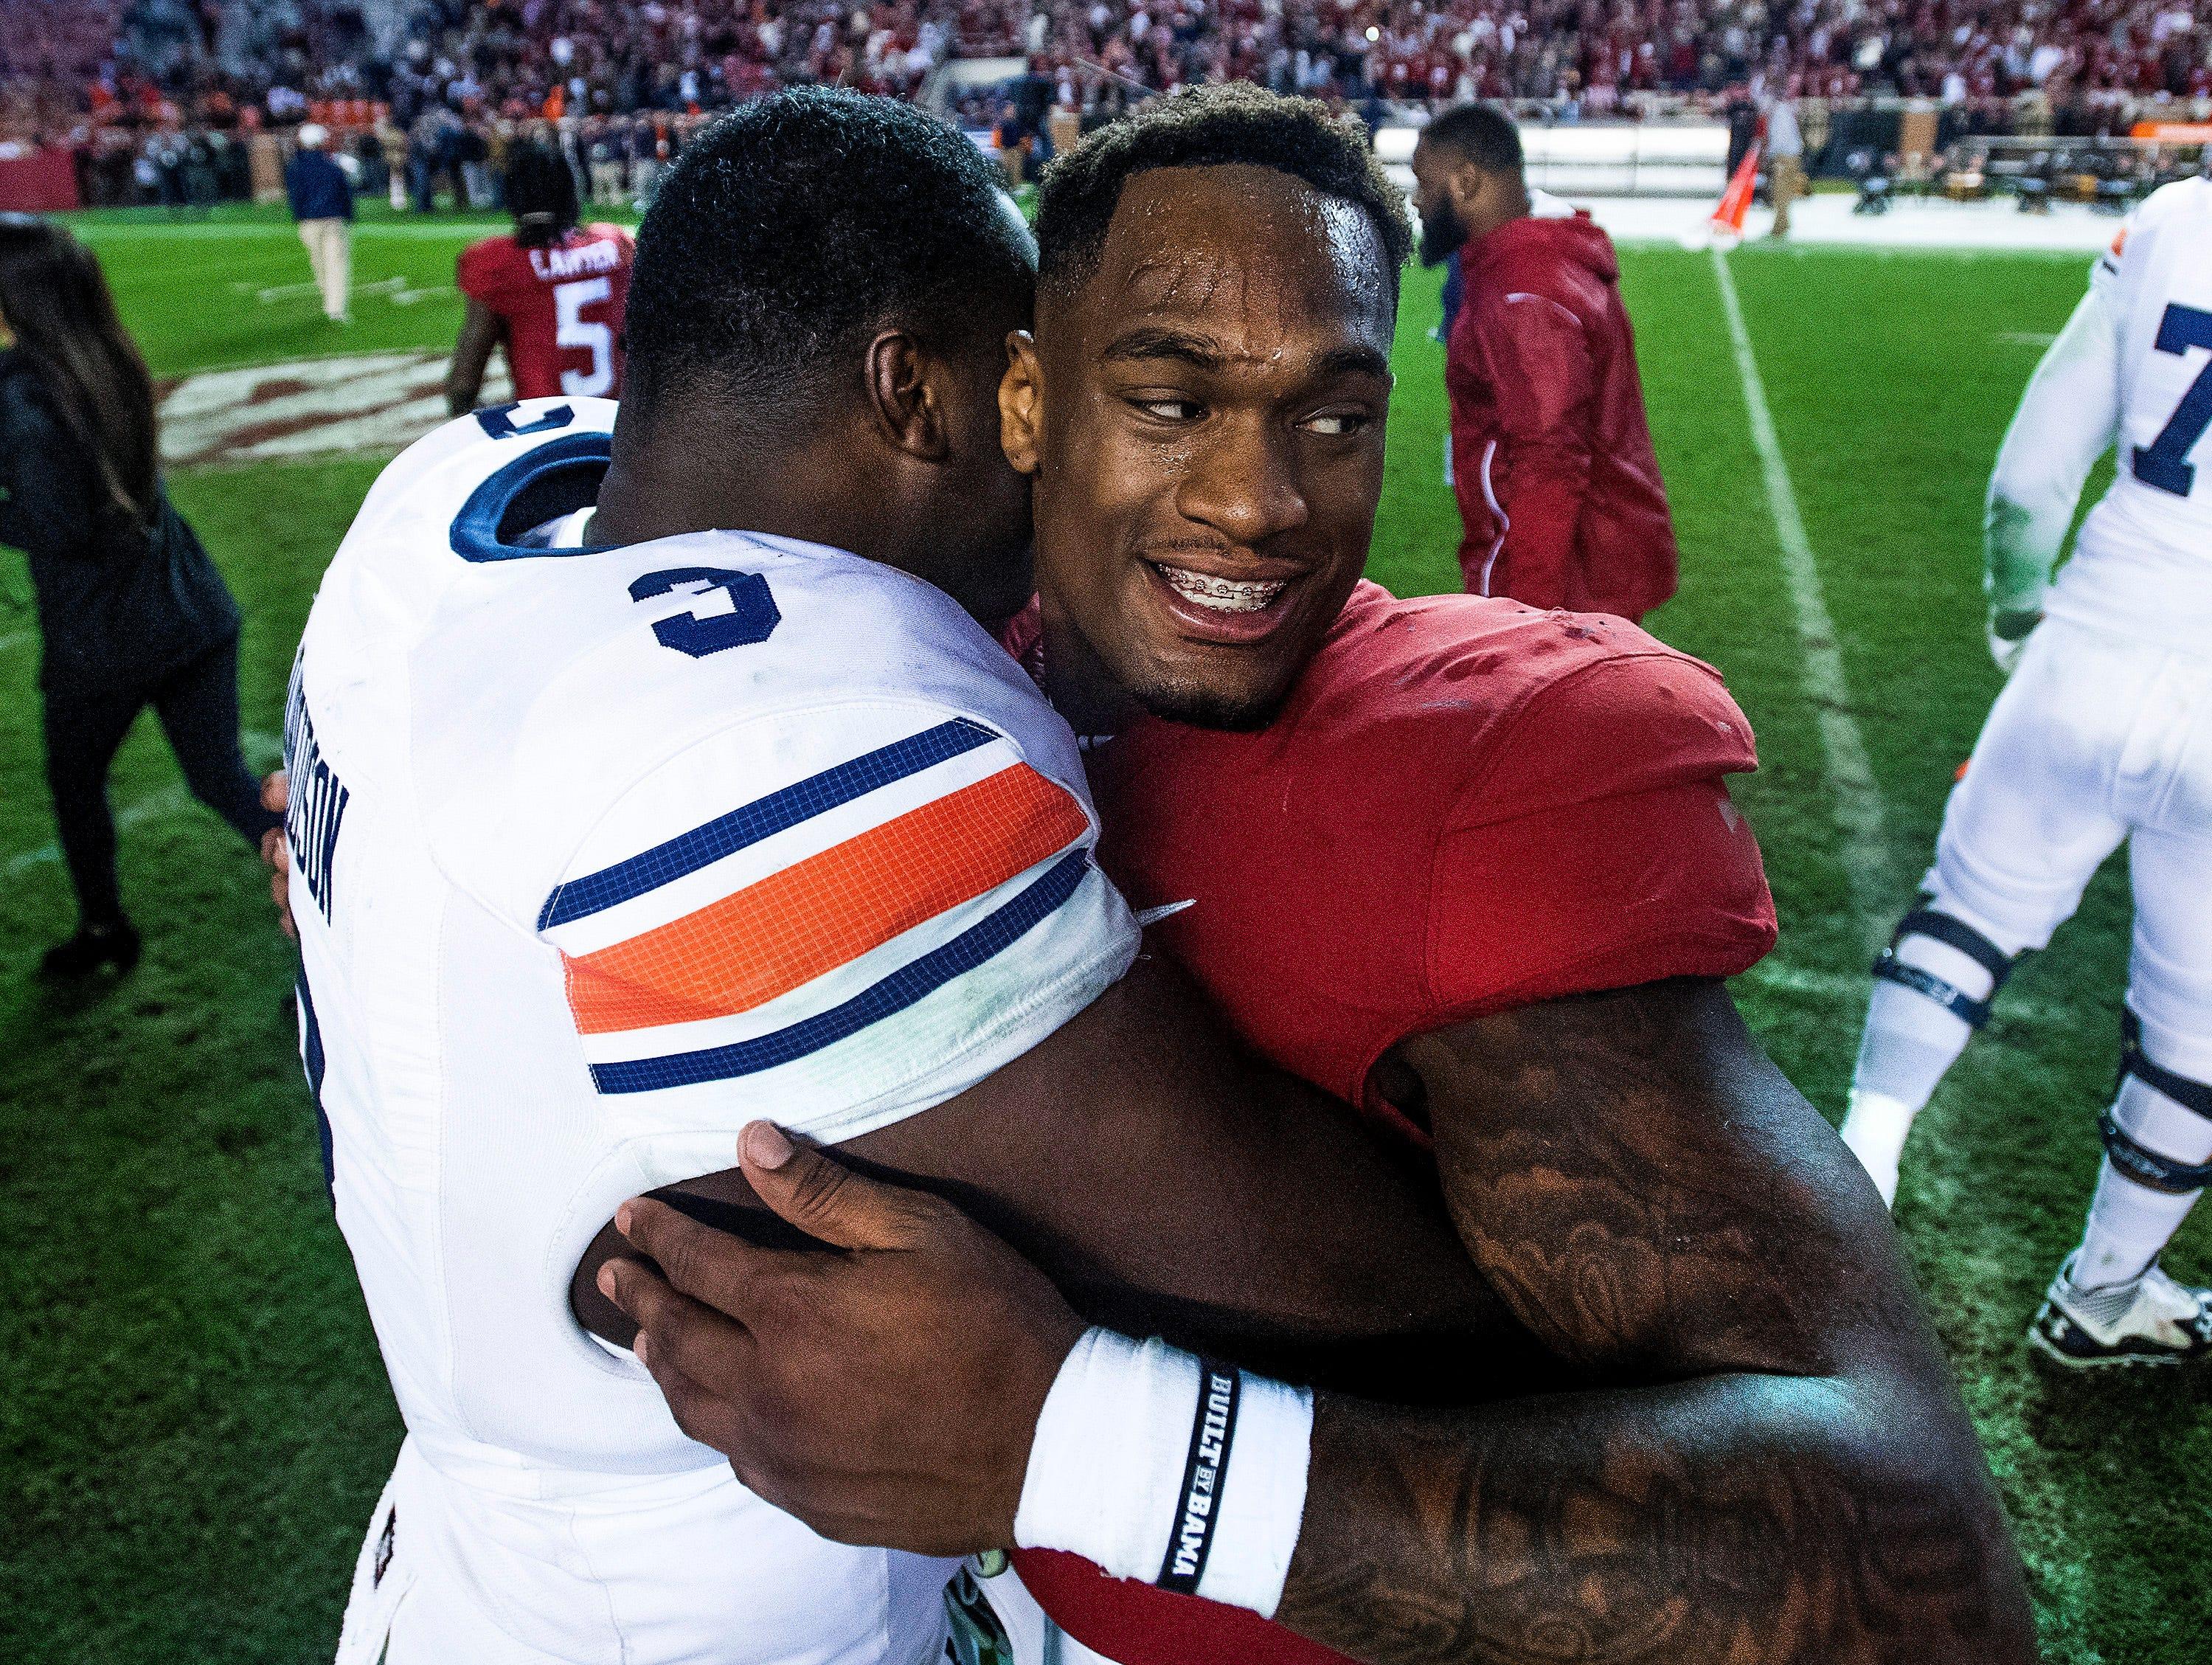 Alabama linebacker Mack Wilson (30) and Auburn defensive lineman Marlon Davidson (3) hug after the Iron Bowl at Bryant-Denny Stadium in Tuscaloosa, Ala., on Saturday November 24, 2018.